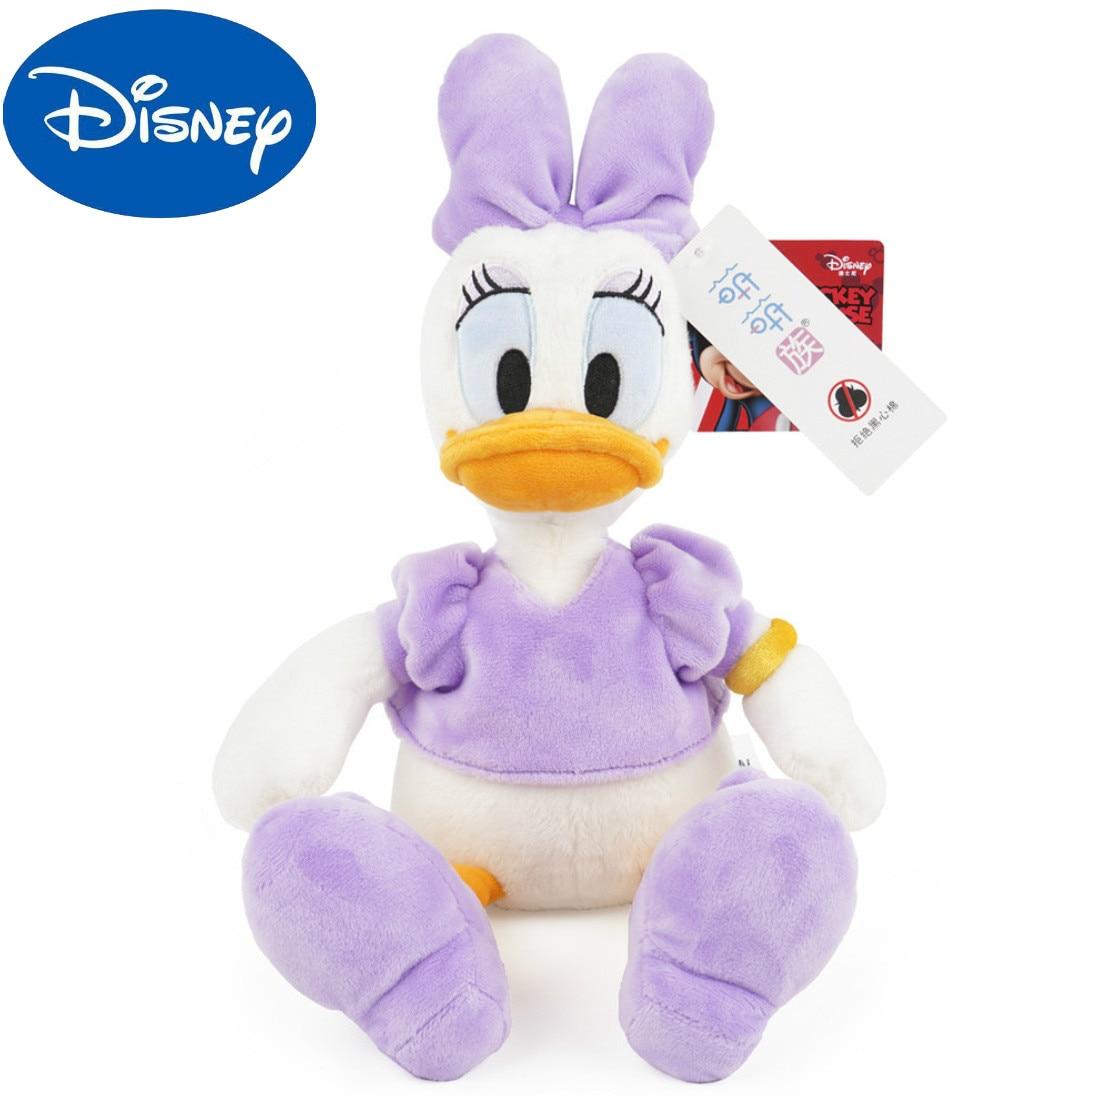 Disney Donald Duck Daisy Plush Toys Animal Stuffed Dolls Birthday Christmas Gift For Kids Wedding Gife For Friend Free Shipping